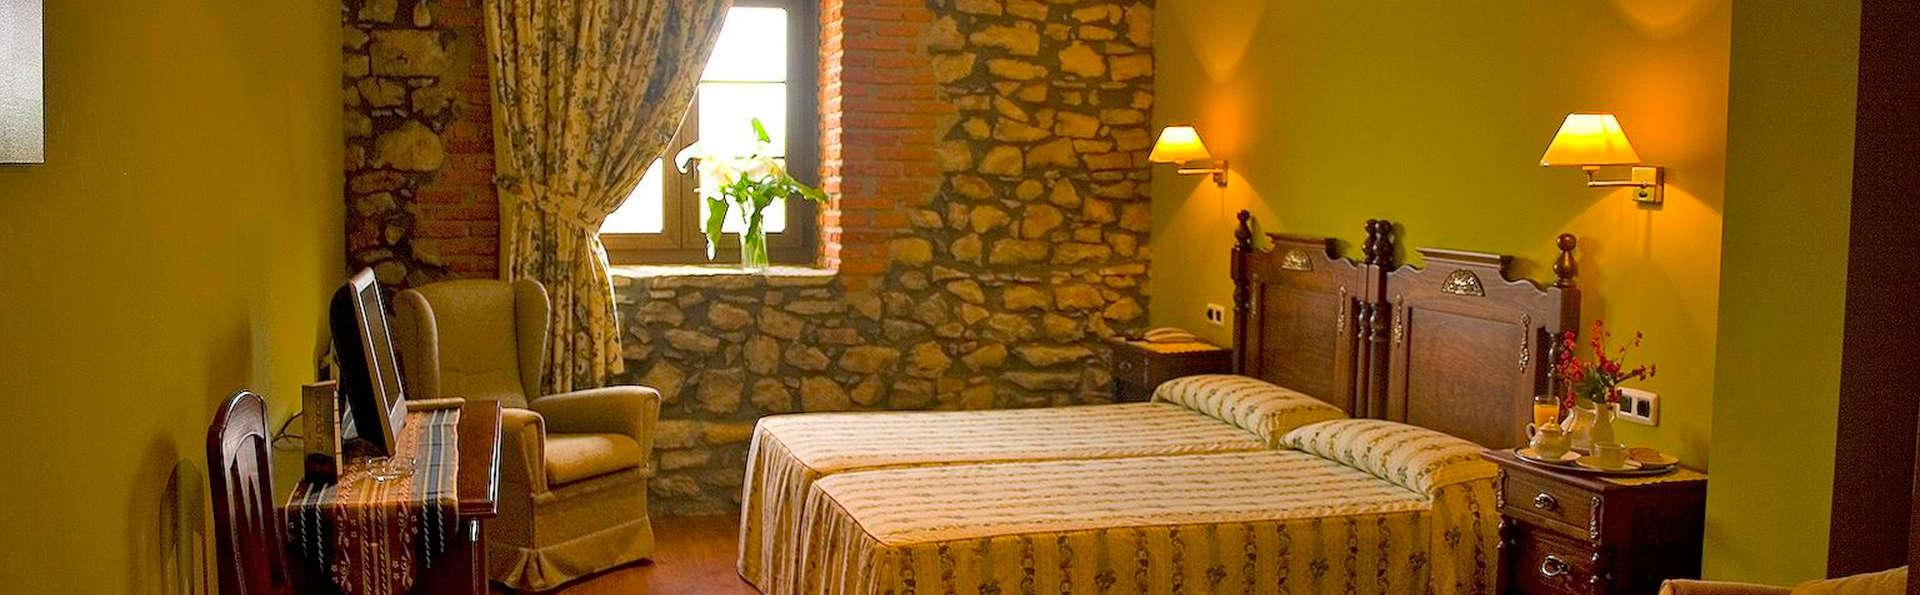 Hotel Casona los Caballeros - EDIT_room7.jpg